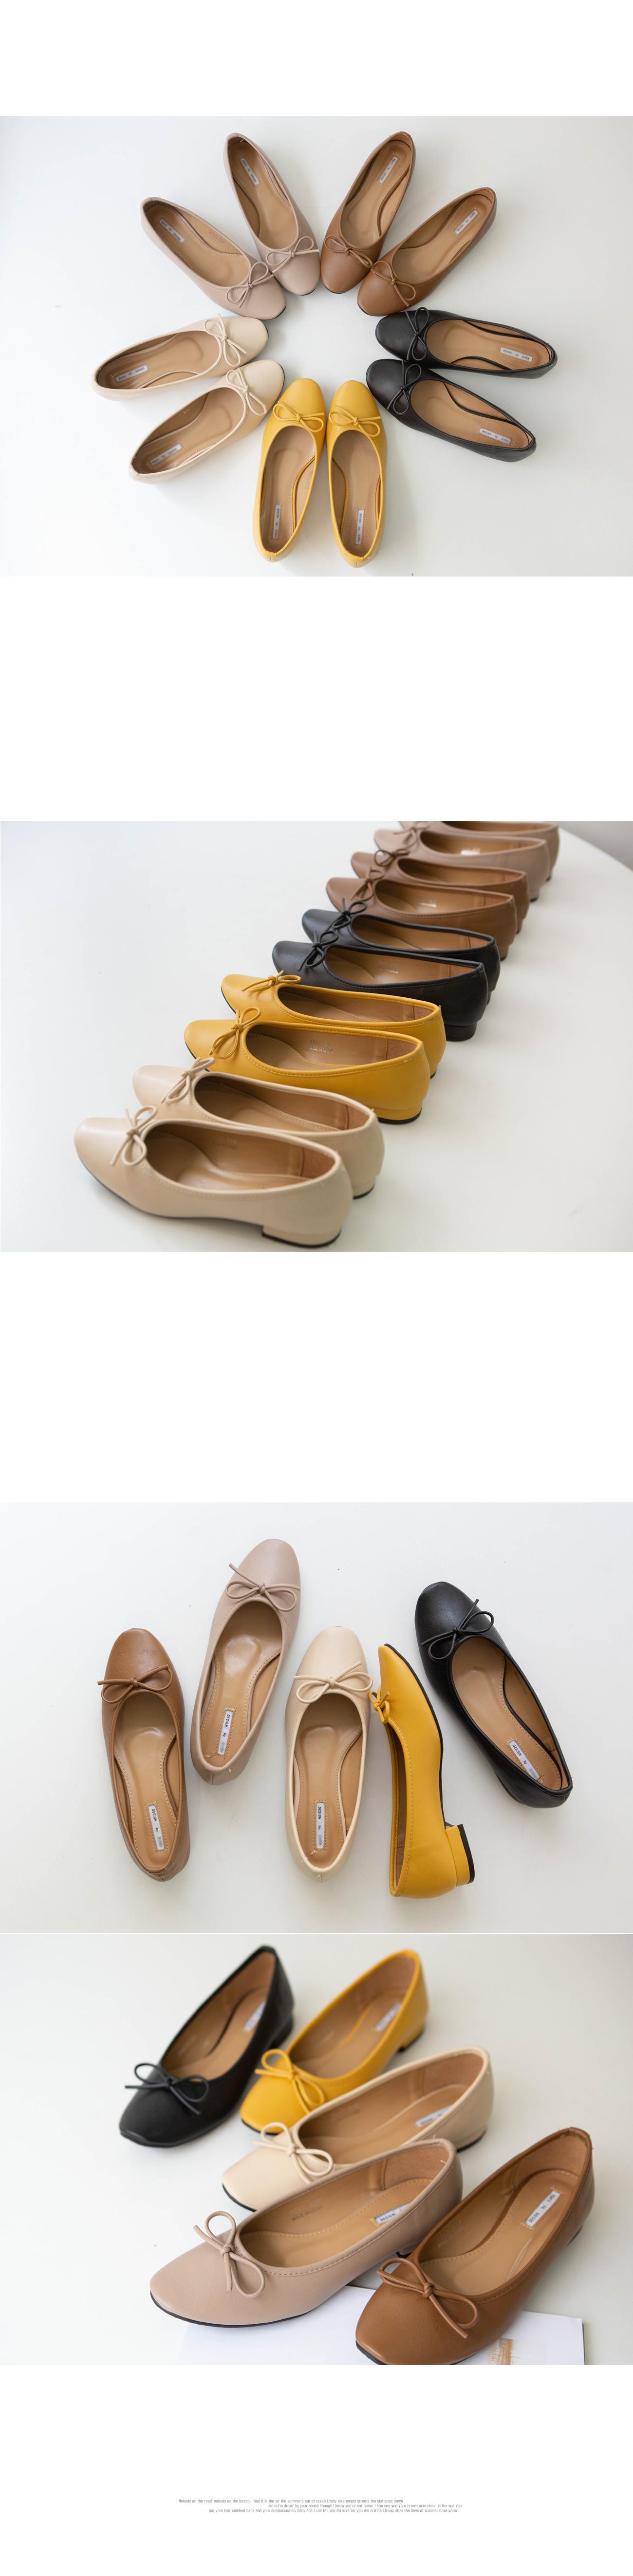 Daily ribbon flat shoes #85448